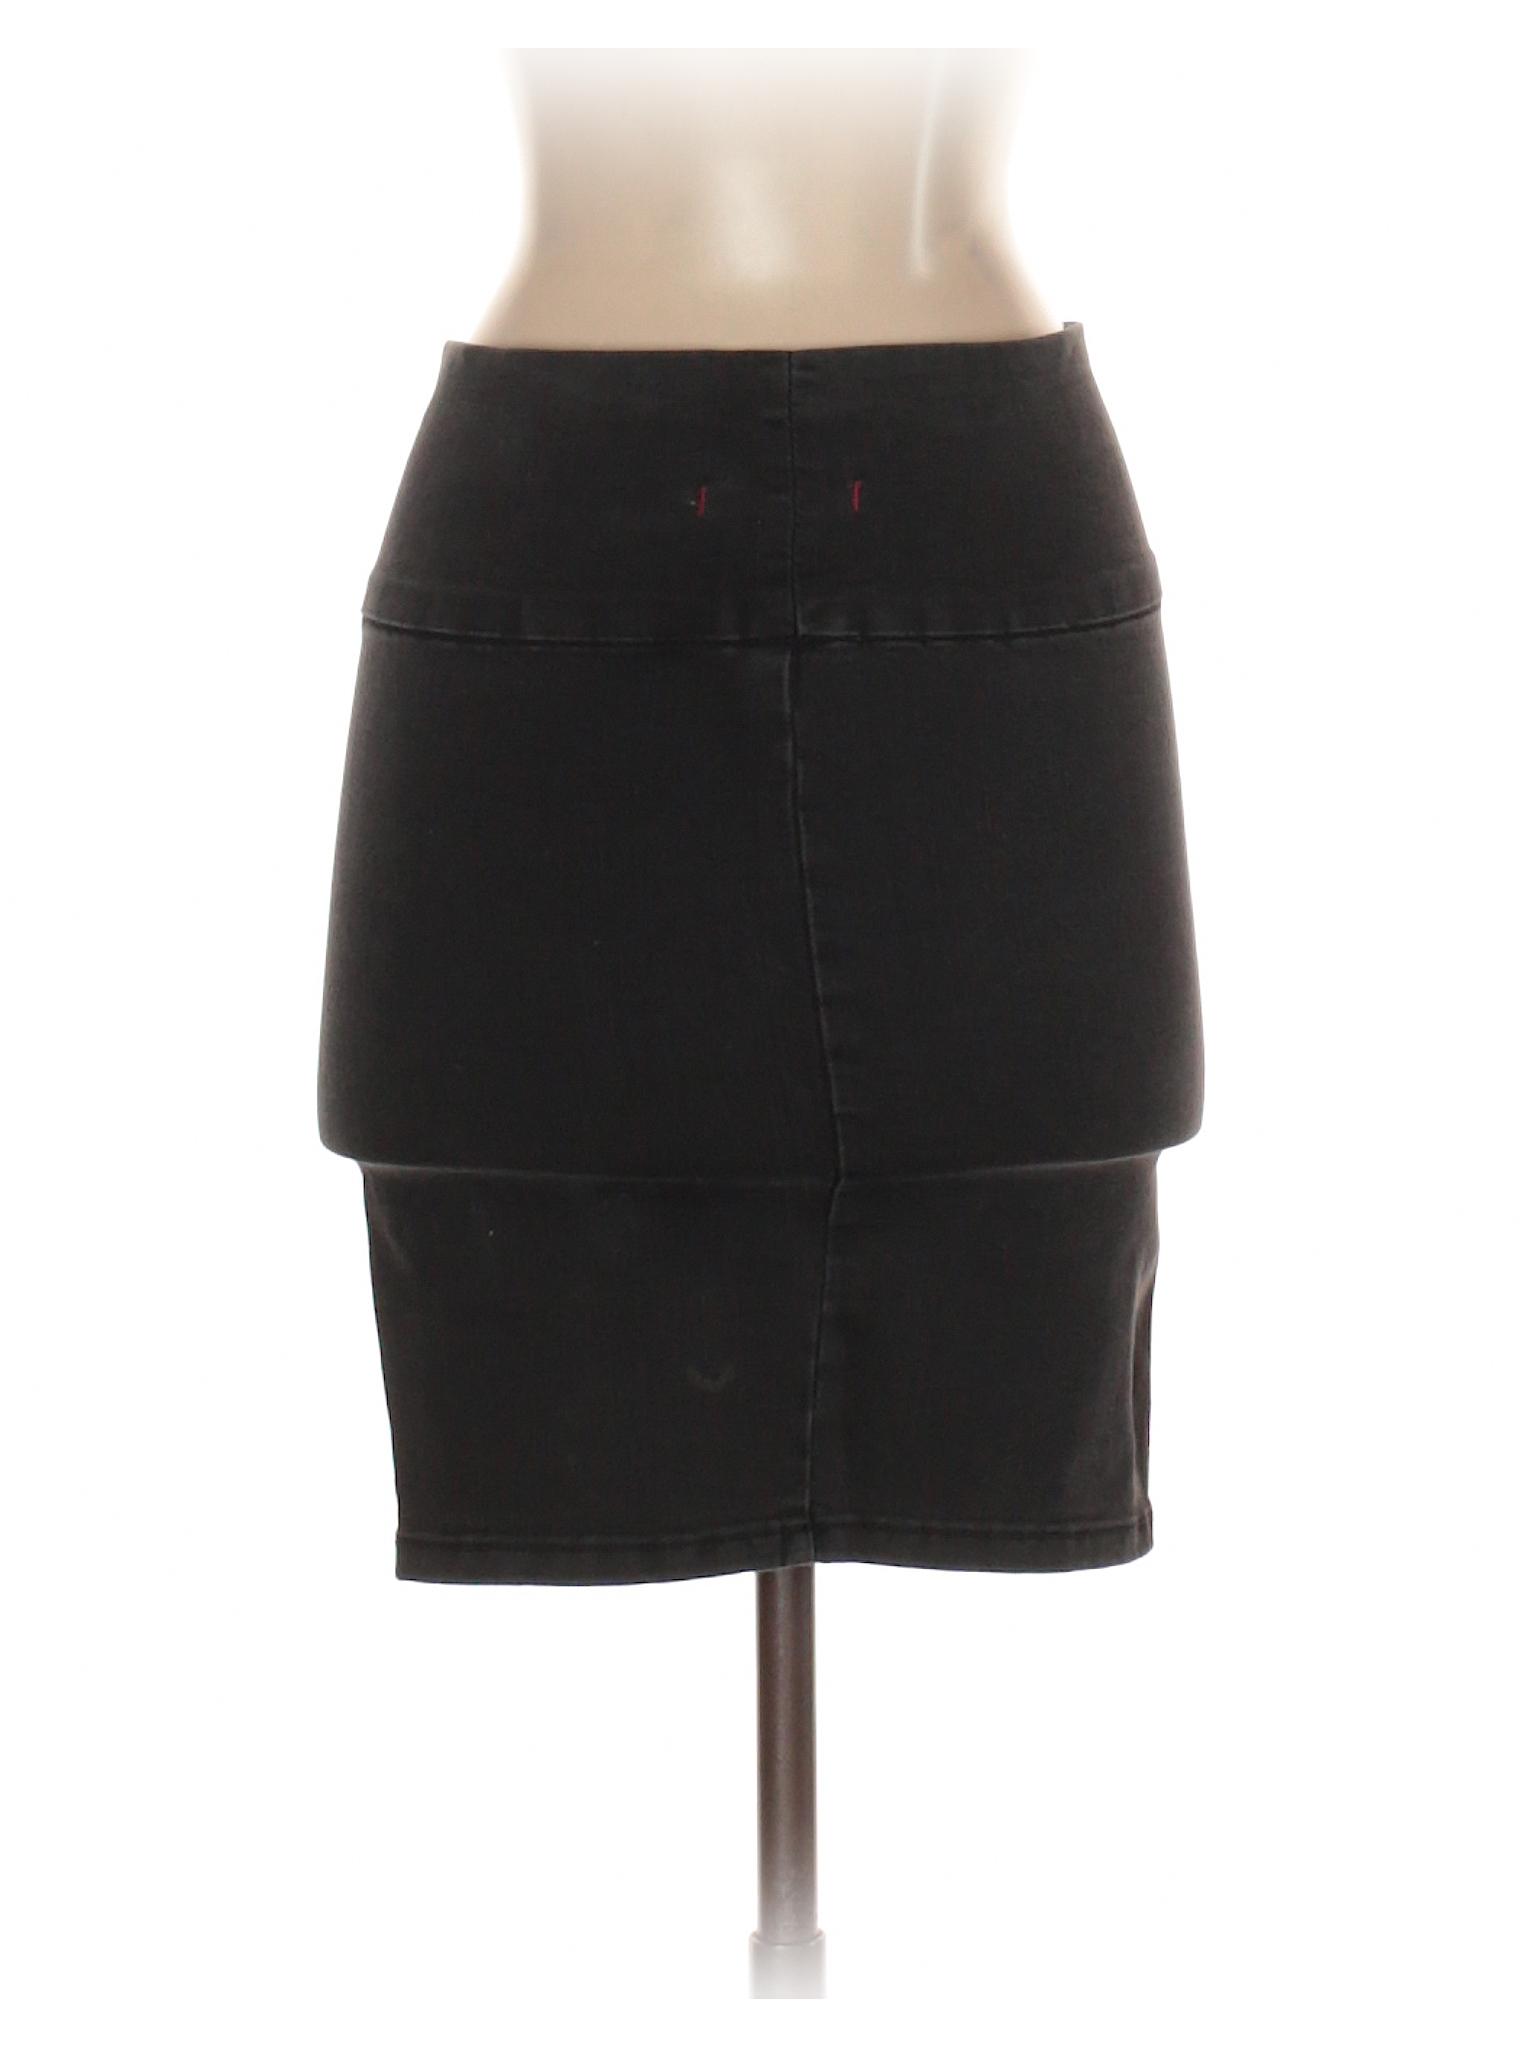 Boutique Casual Boutique Skirt Boutique Skirt Skirt Boutique Casual Boutique Casual Skirt Casual Casual Boutique Skirt Casual Skirt v8qHxCrwv